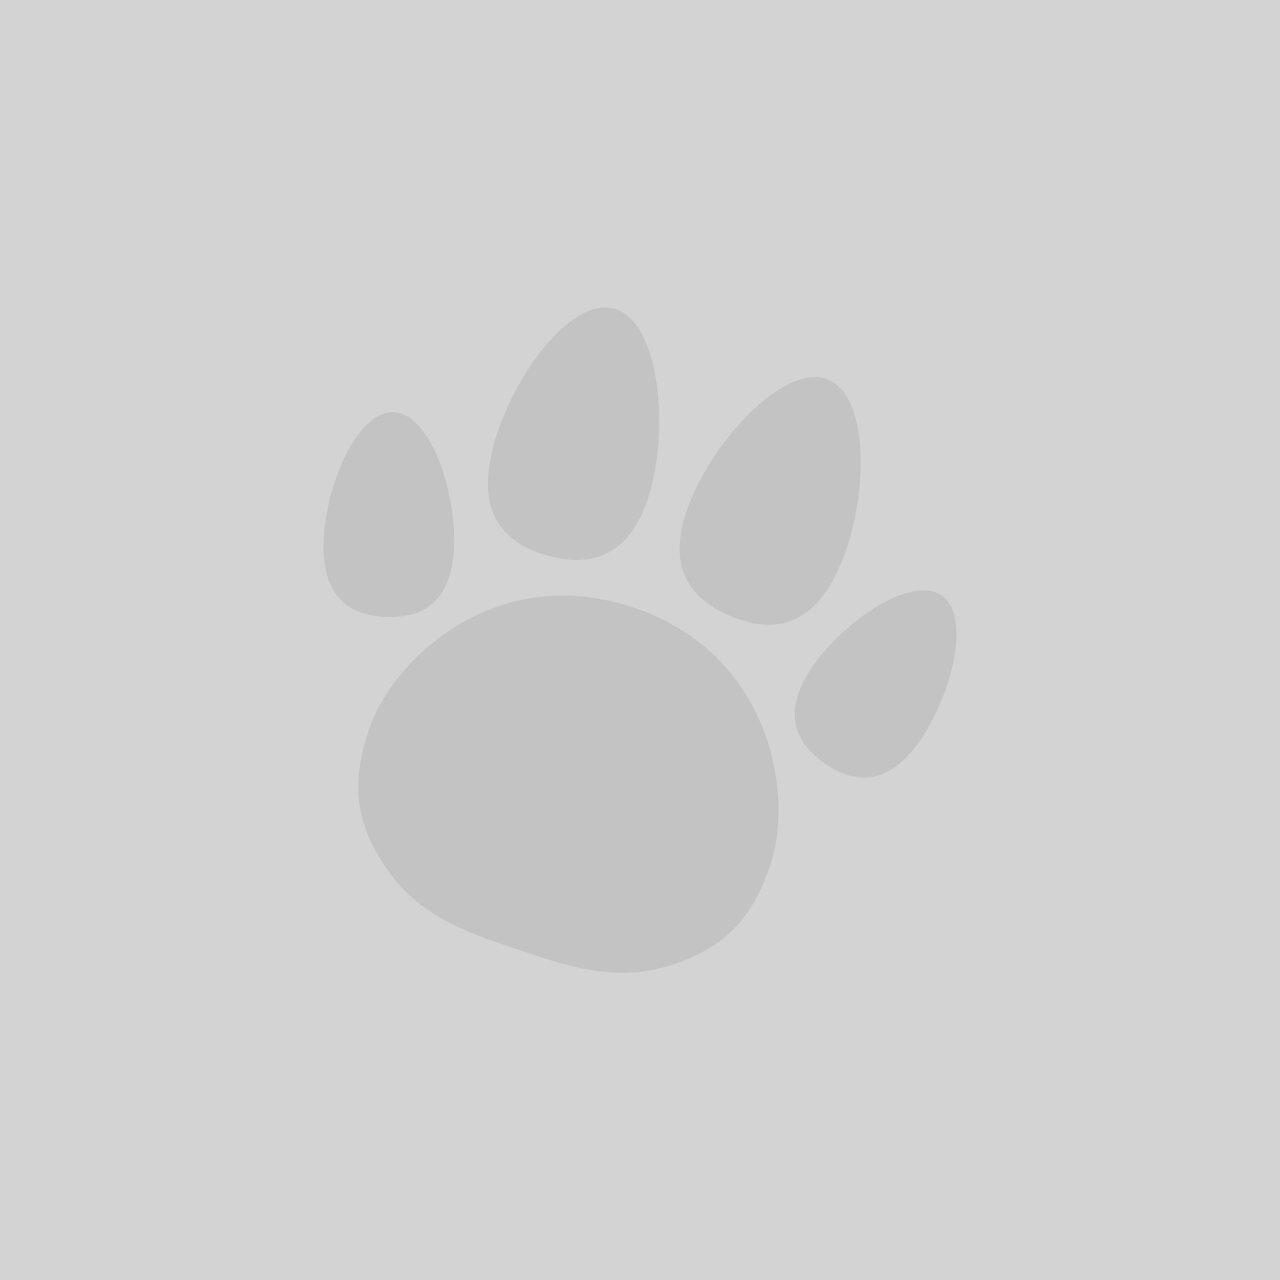 Beaphar Cat Flea Collar - Reflective Yellow